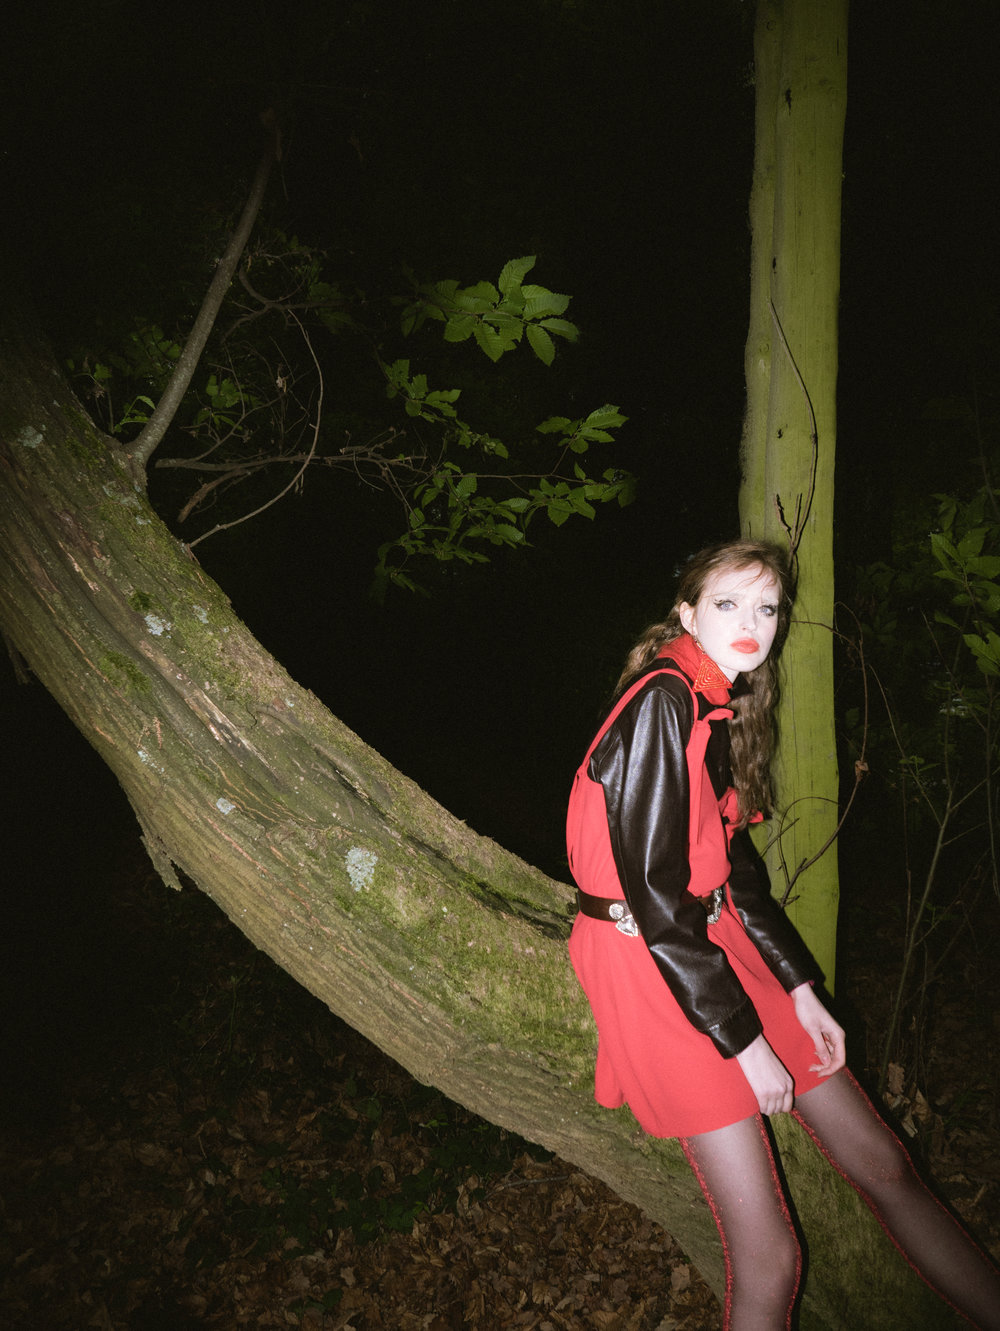 sami oliver nakari_dark woods_02.jpg